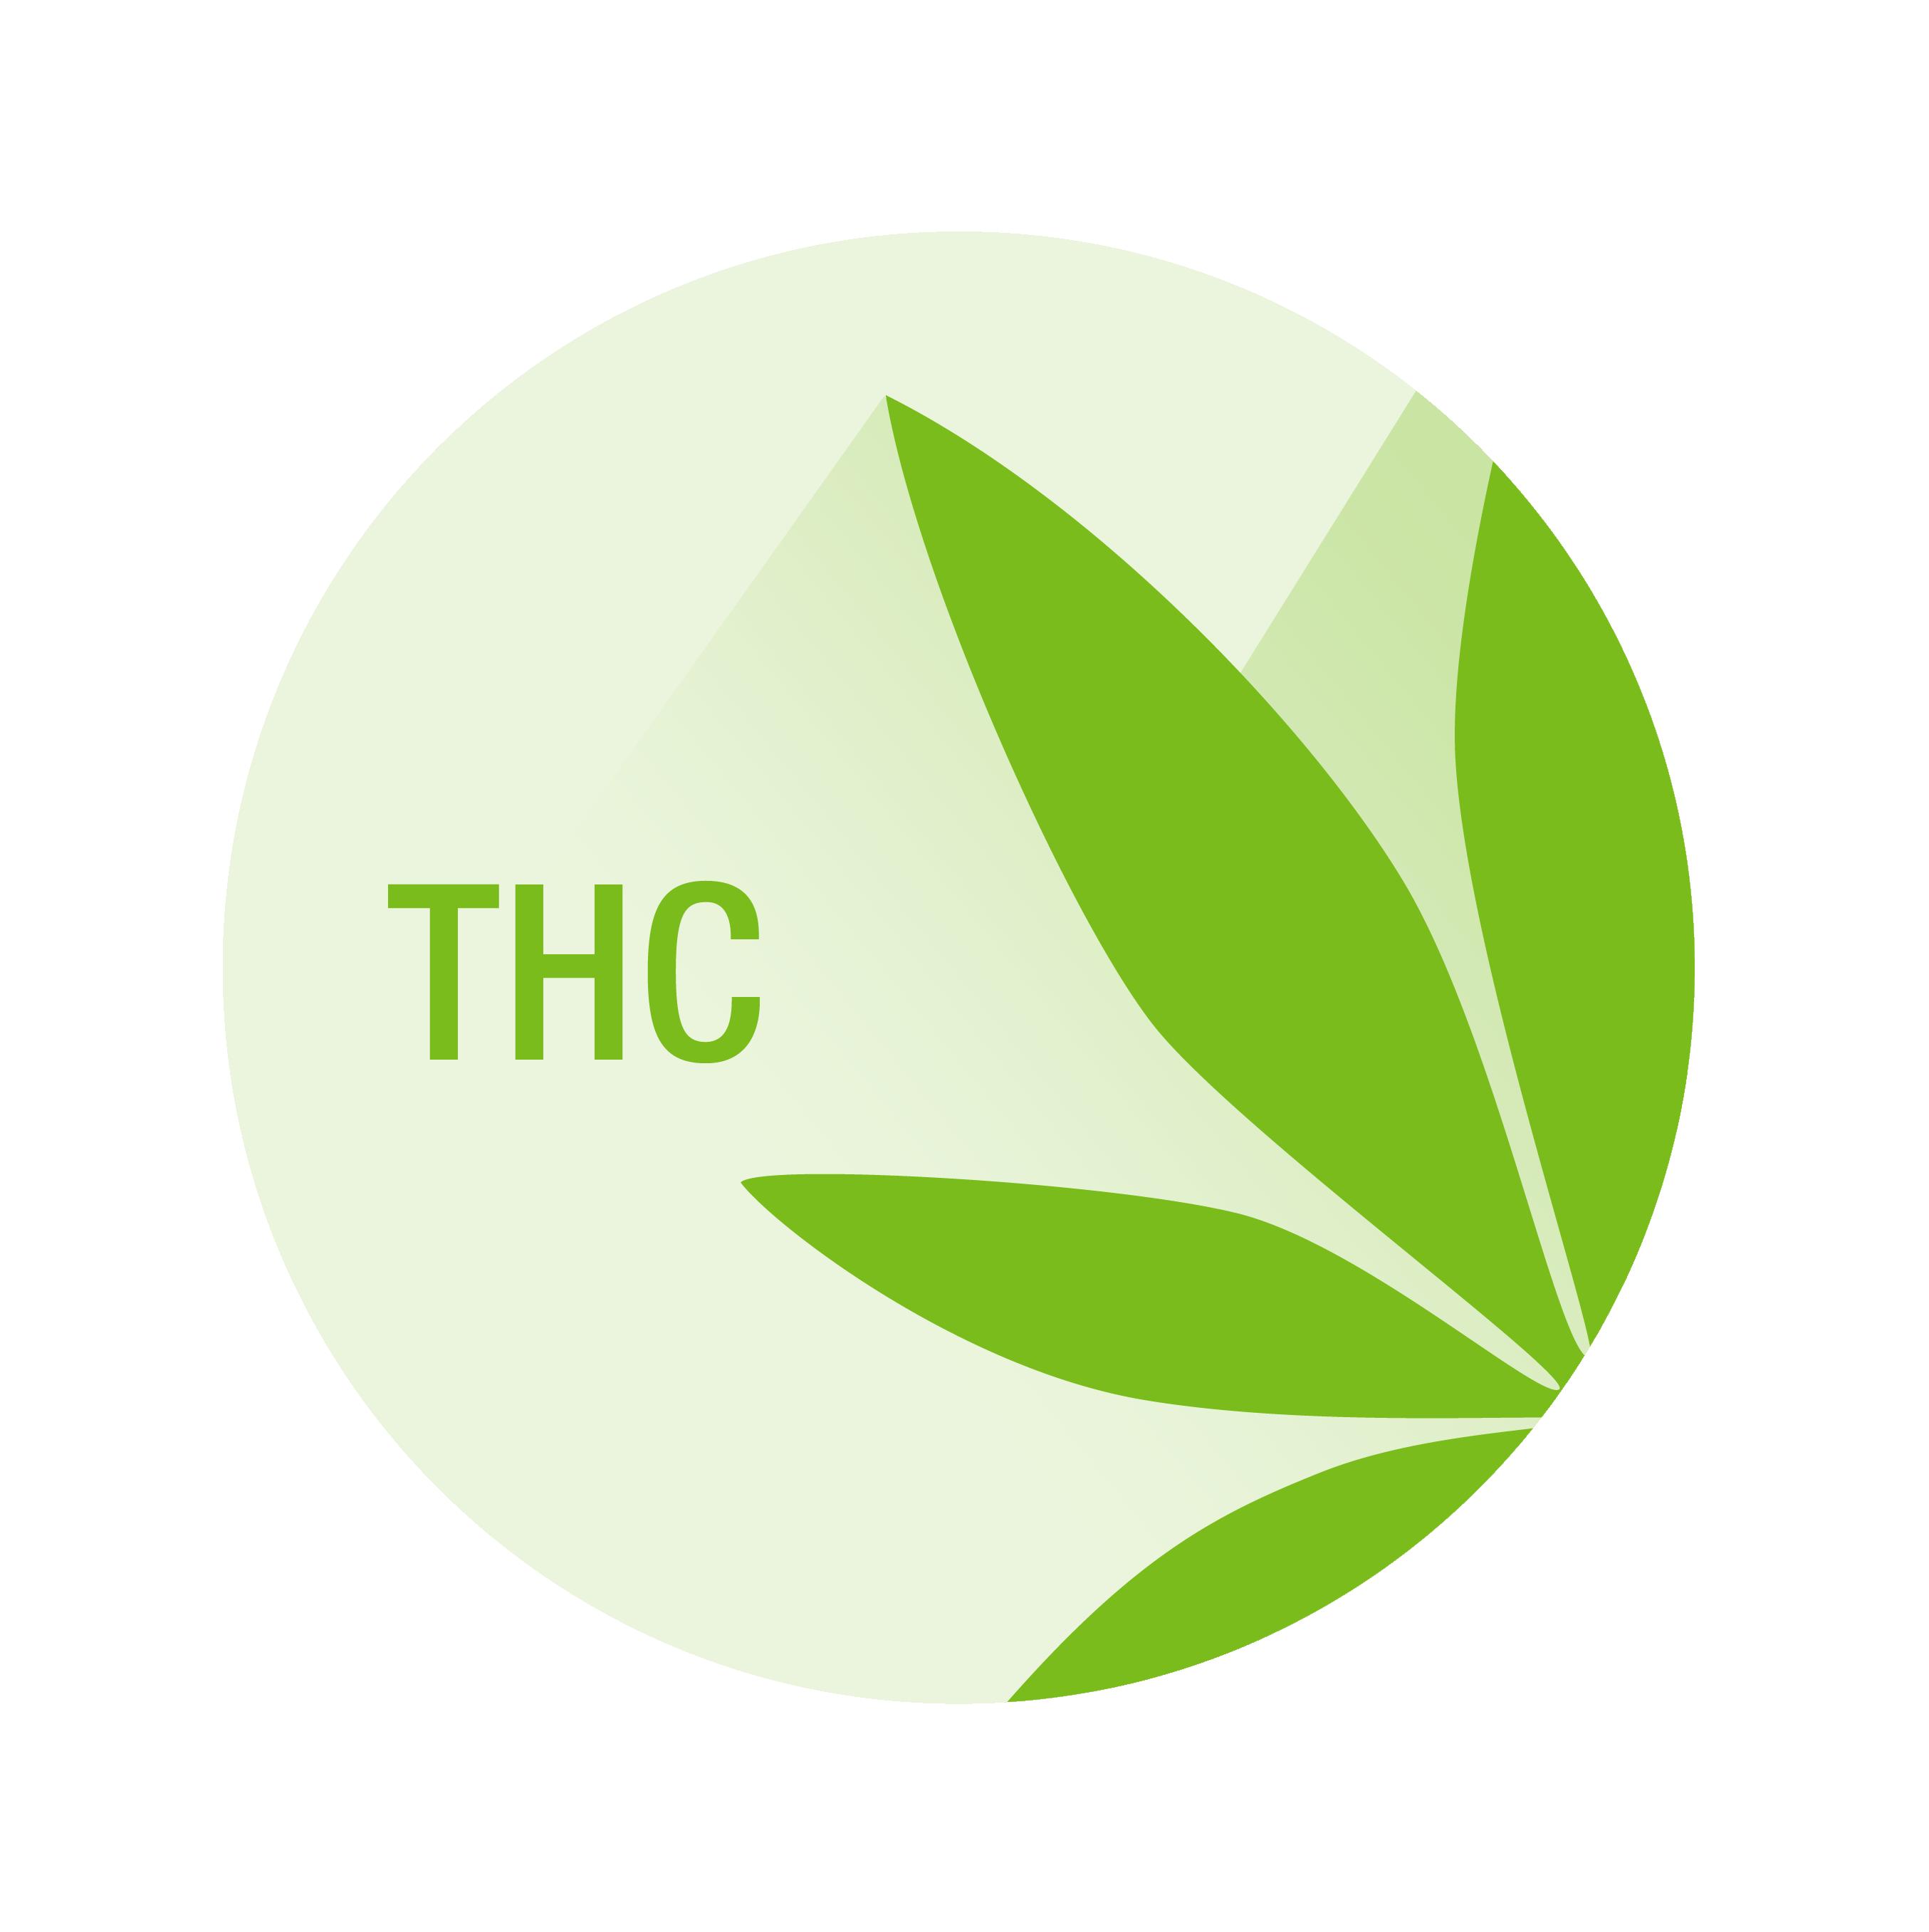 THC label with marijuana leaf